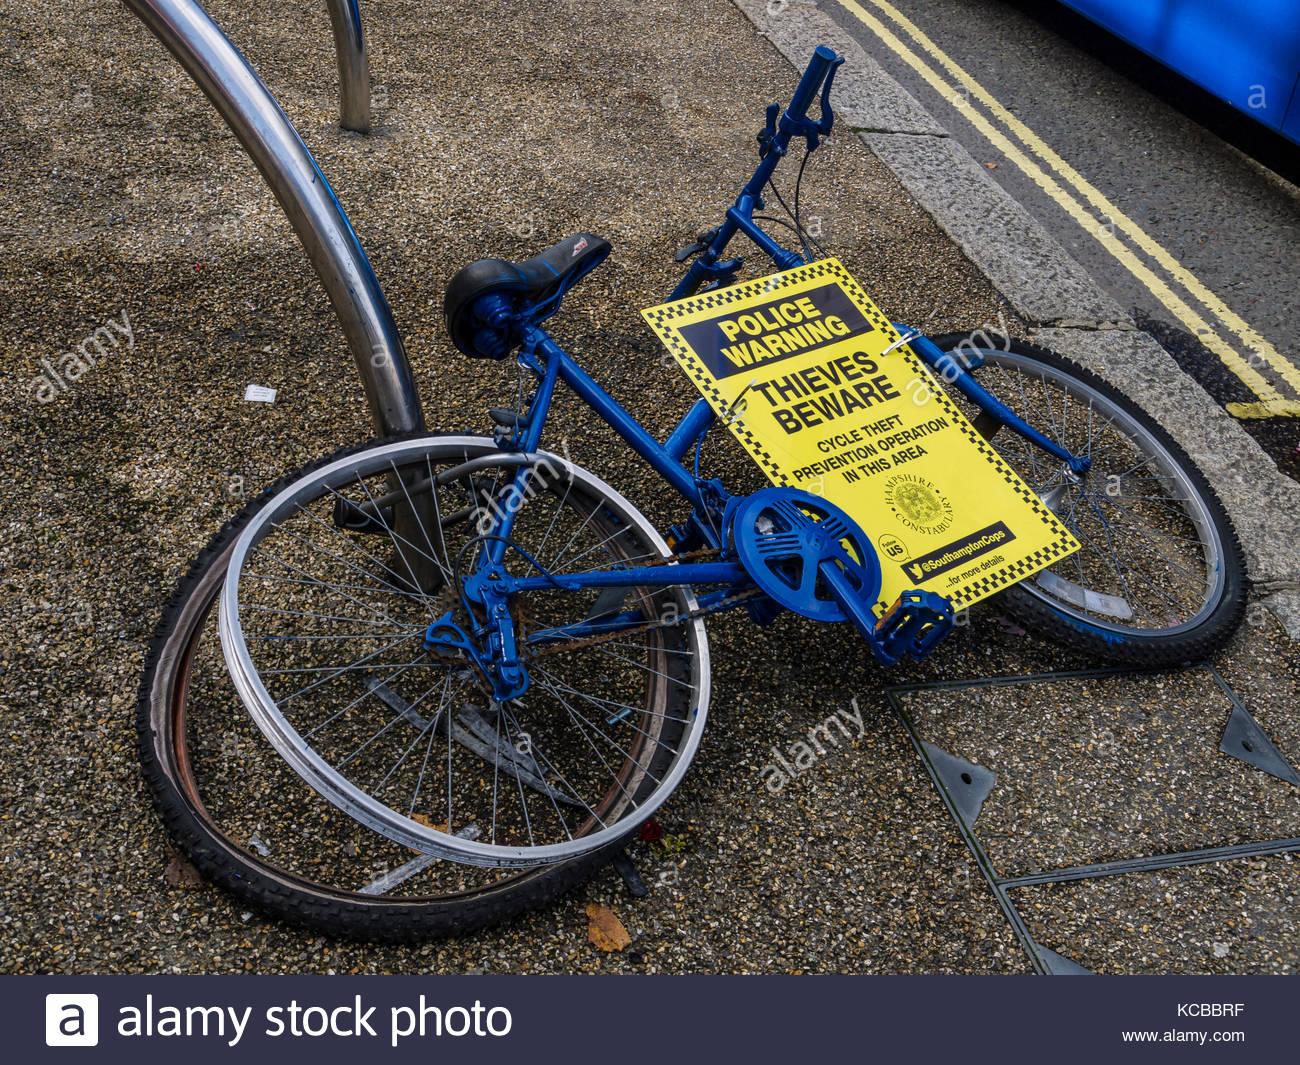 Polizei Motorrad Diebstahl Warnung Southampton, Hampshire england Stockbild